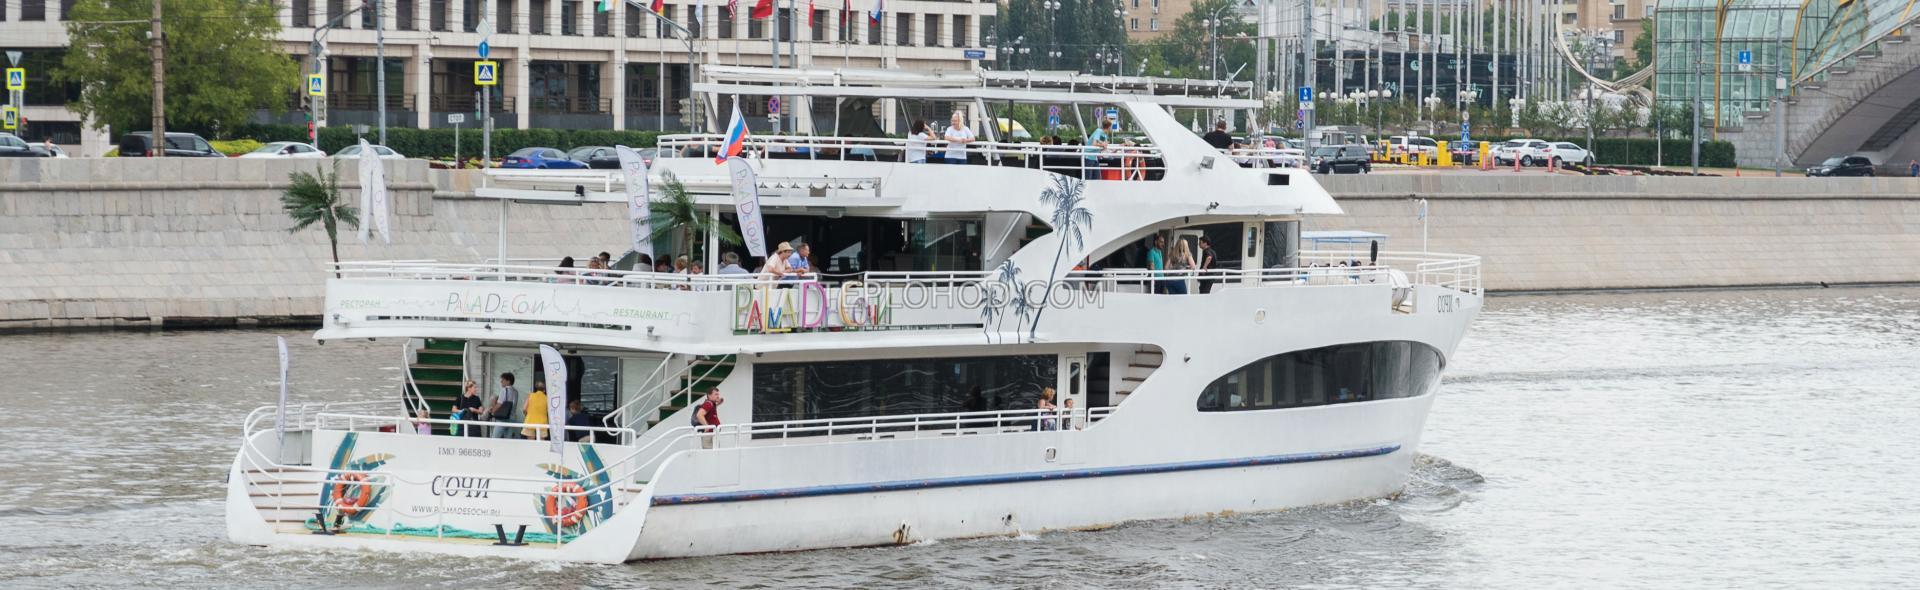 "Прогулка по Москве-реке на яхте класса ""люкс"" - ""Palma де Сочи"" с авторскими сетами"